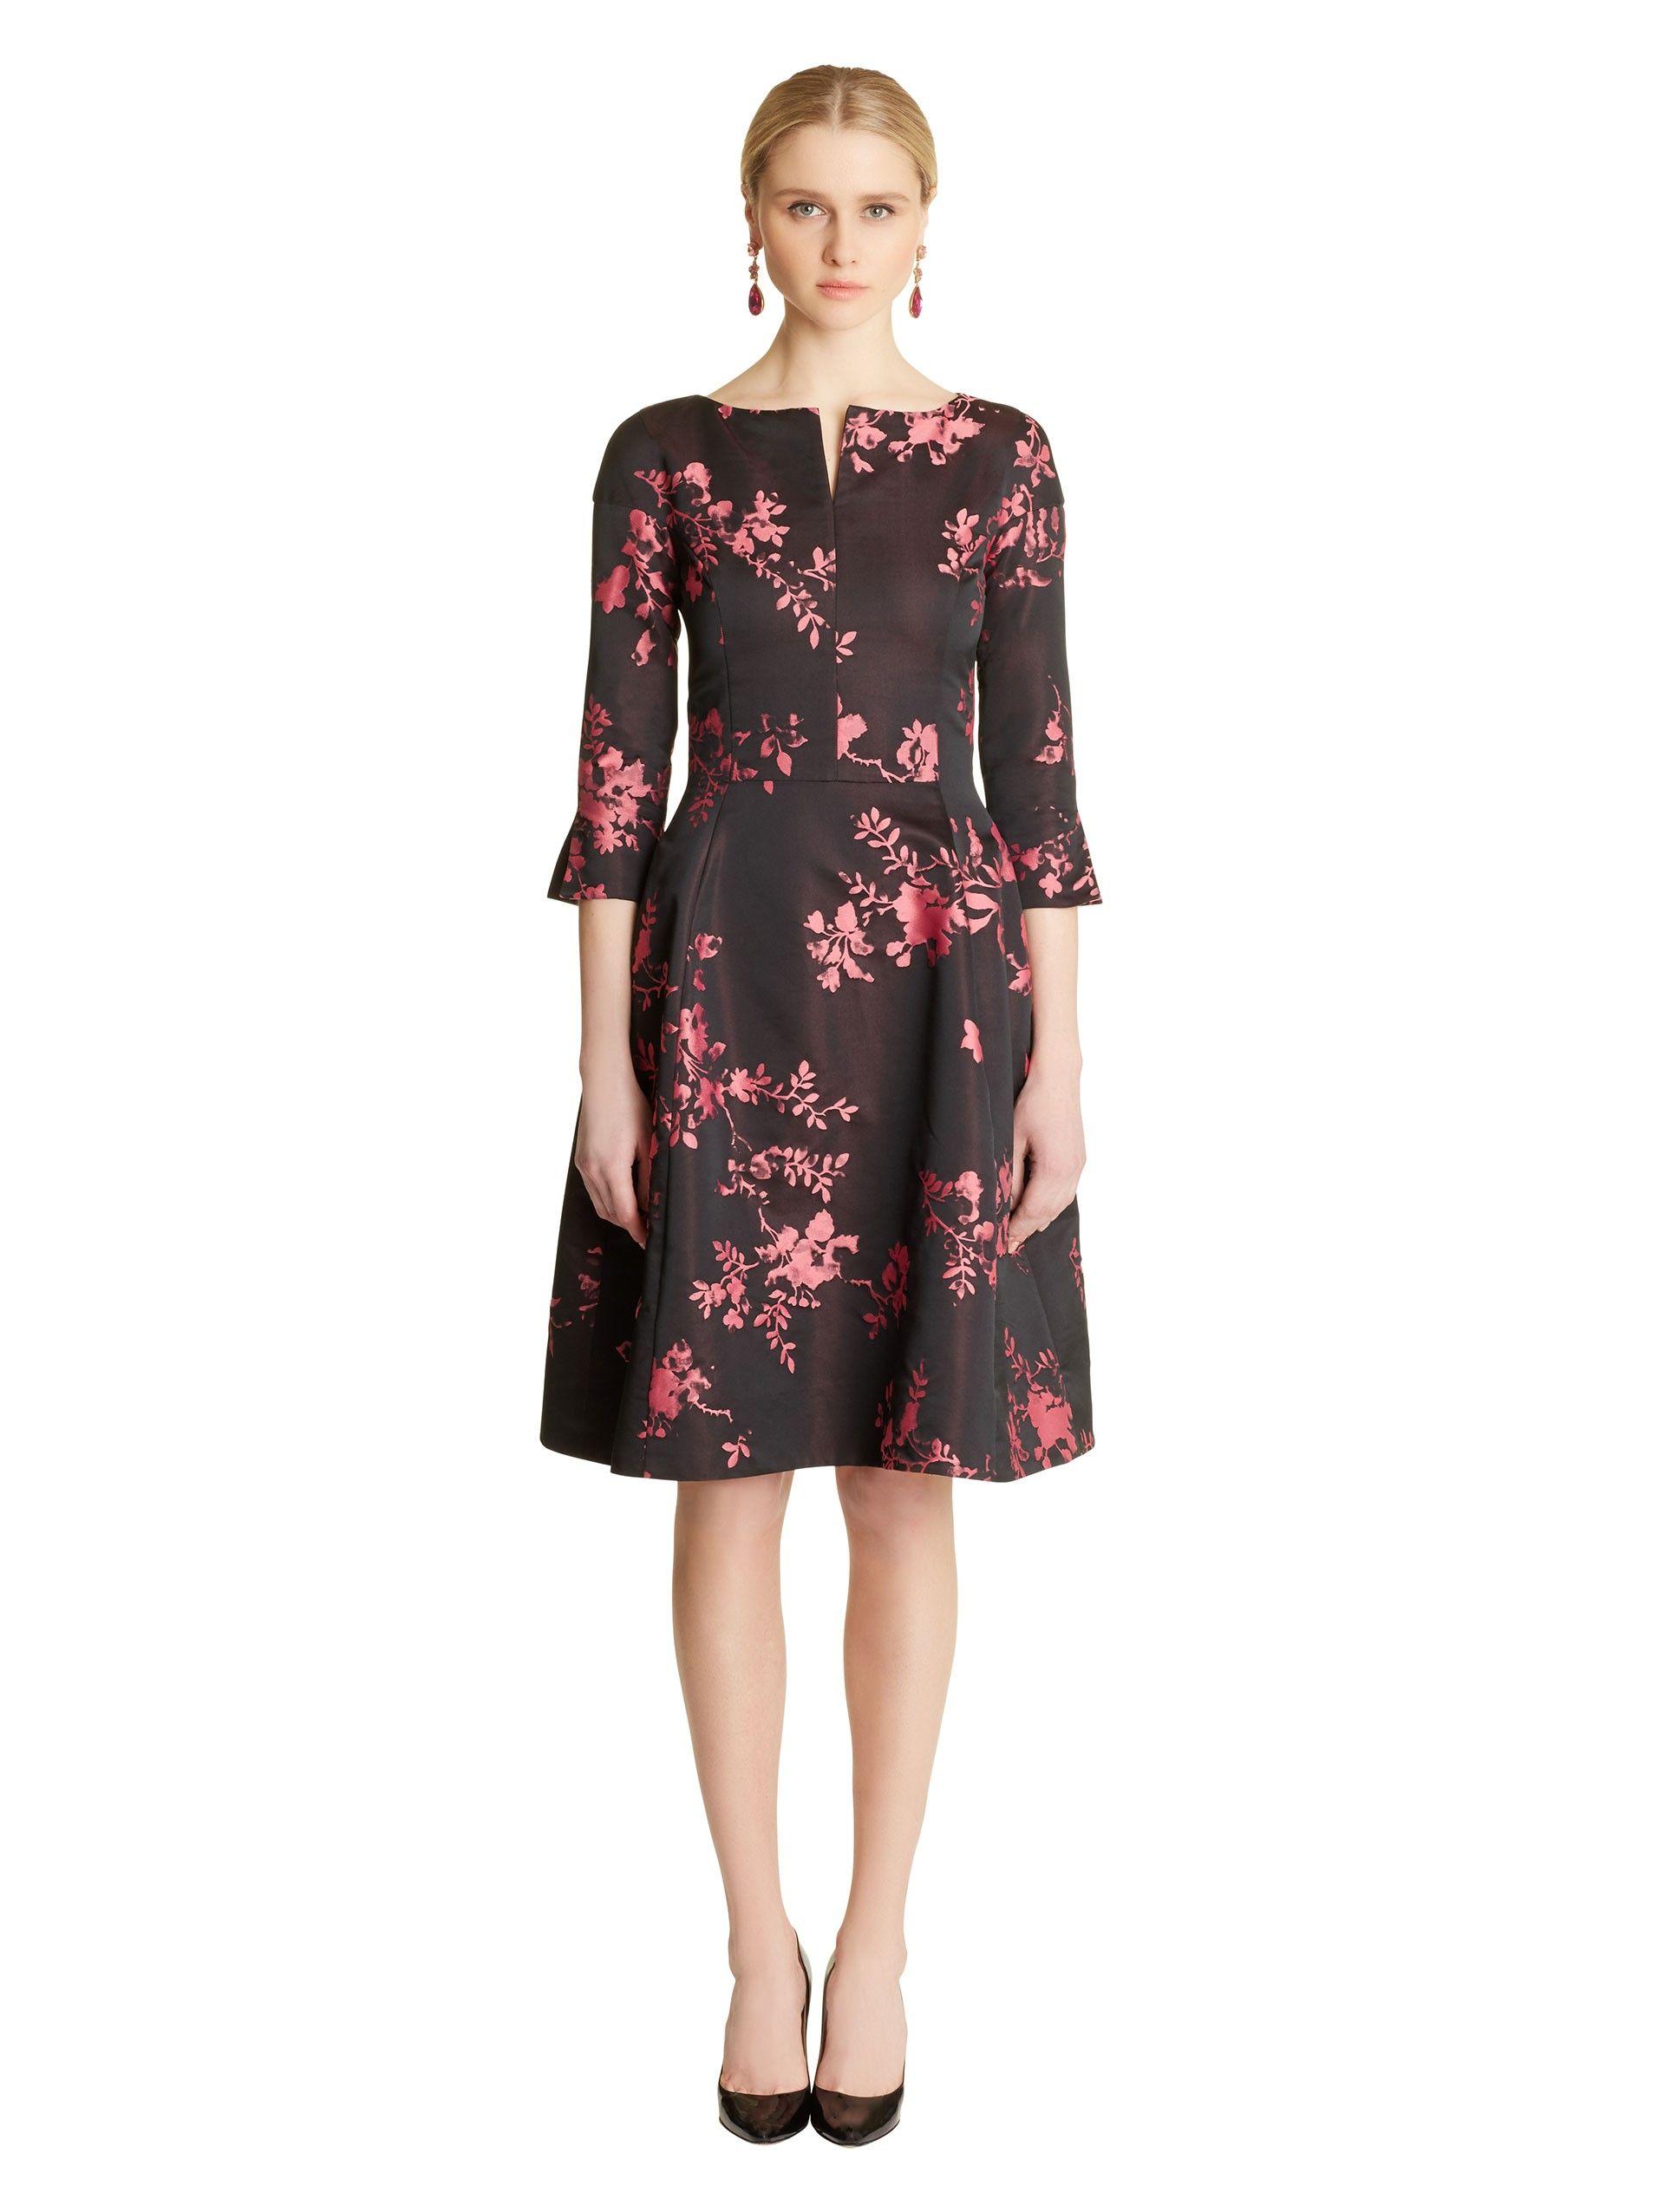 Oscar De La Renta Photographic Floral Jacquard 34 Sleeve Dress